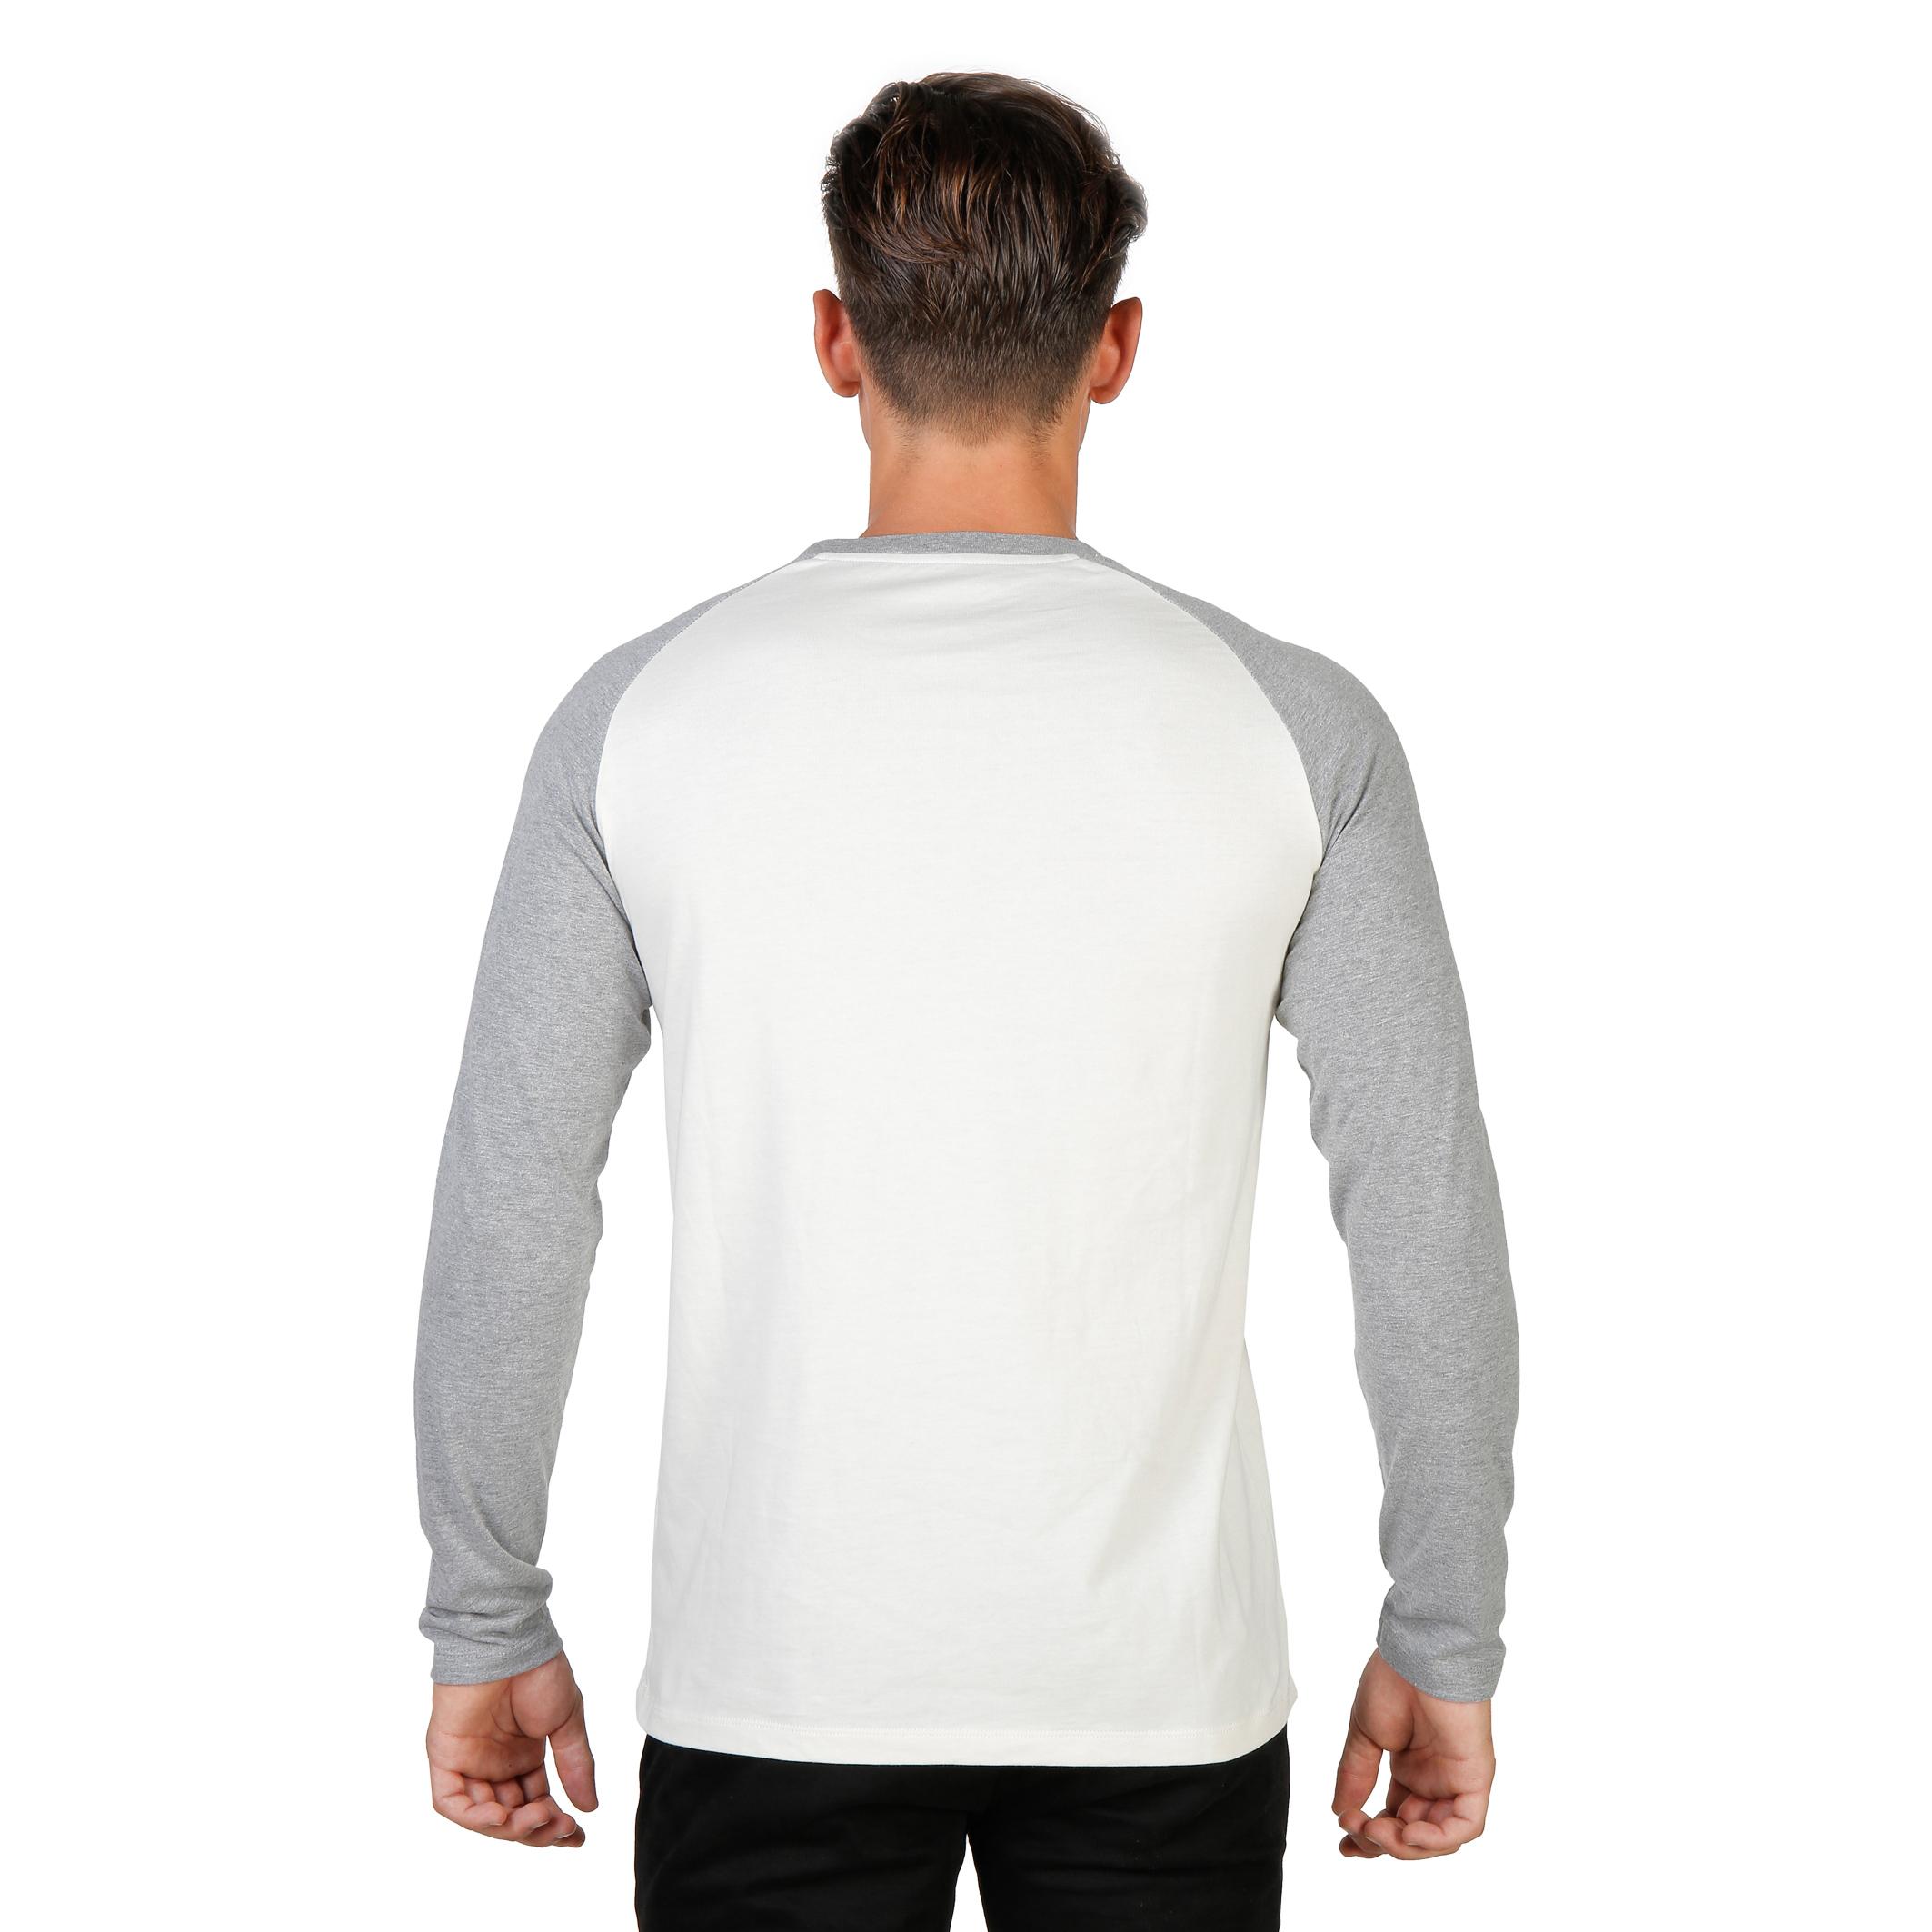 Tee-shirts  Oxford University TRINITY-RAGLAN-ML grey